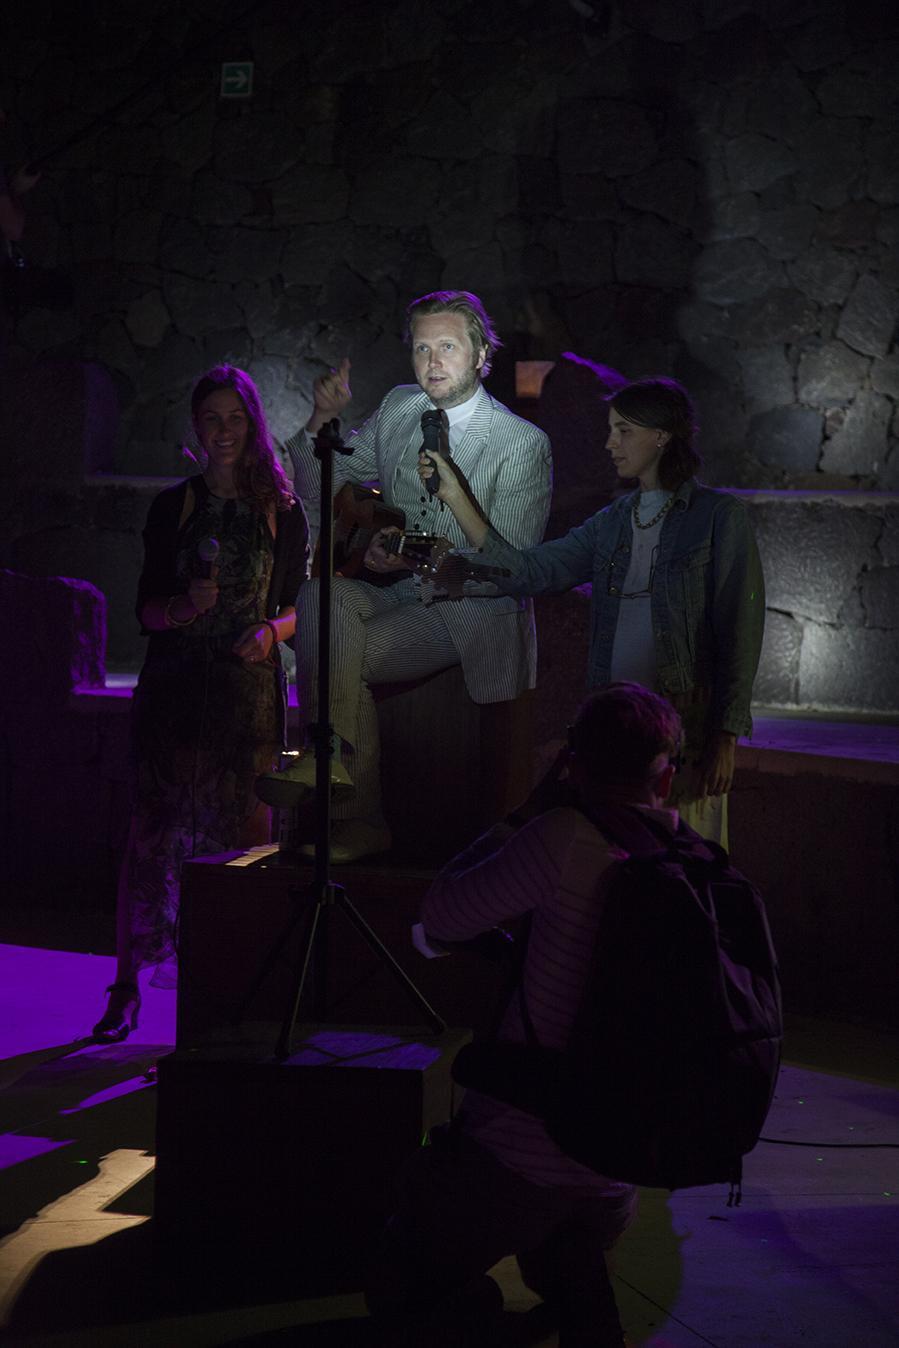 A musical performance by Ragnar Kjartansson on Day 2: /Isolation/ Photo:Giovanna Silva Courtesy Fiorucci Art Trust, London